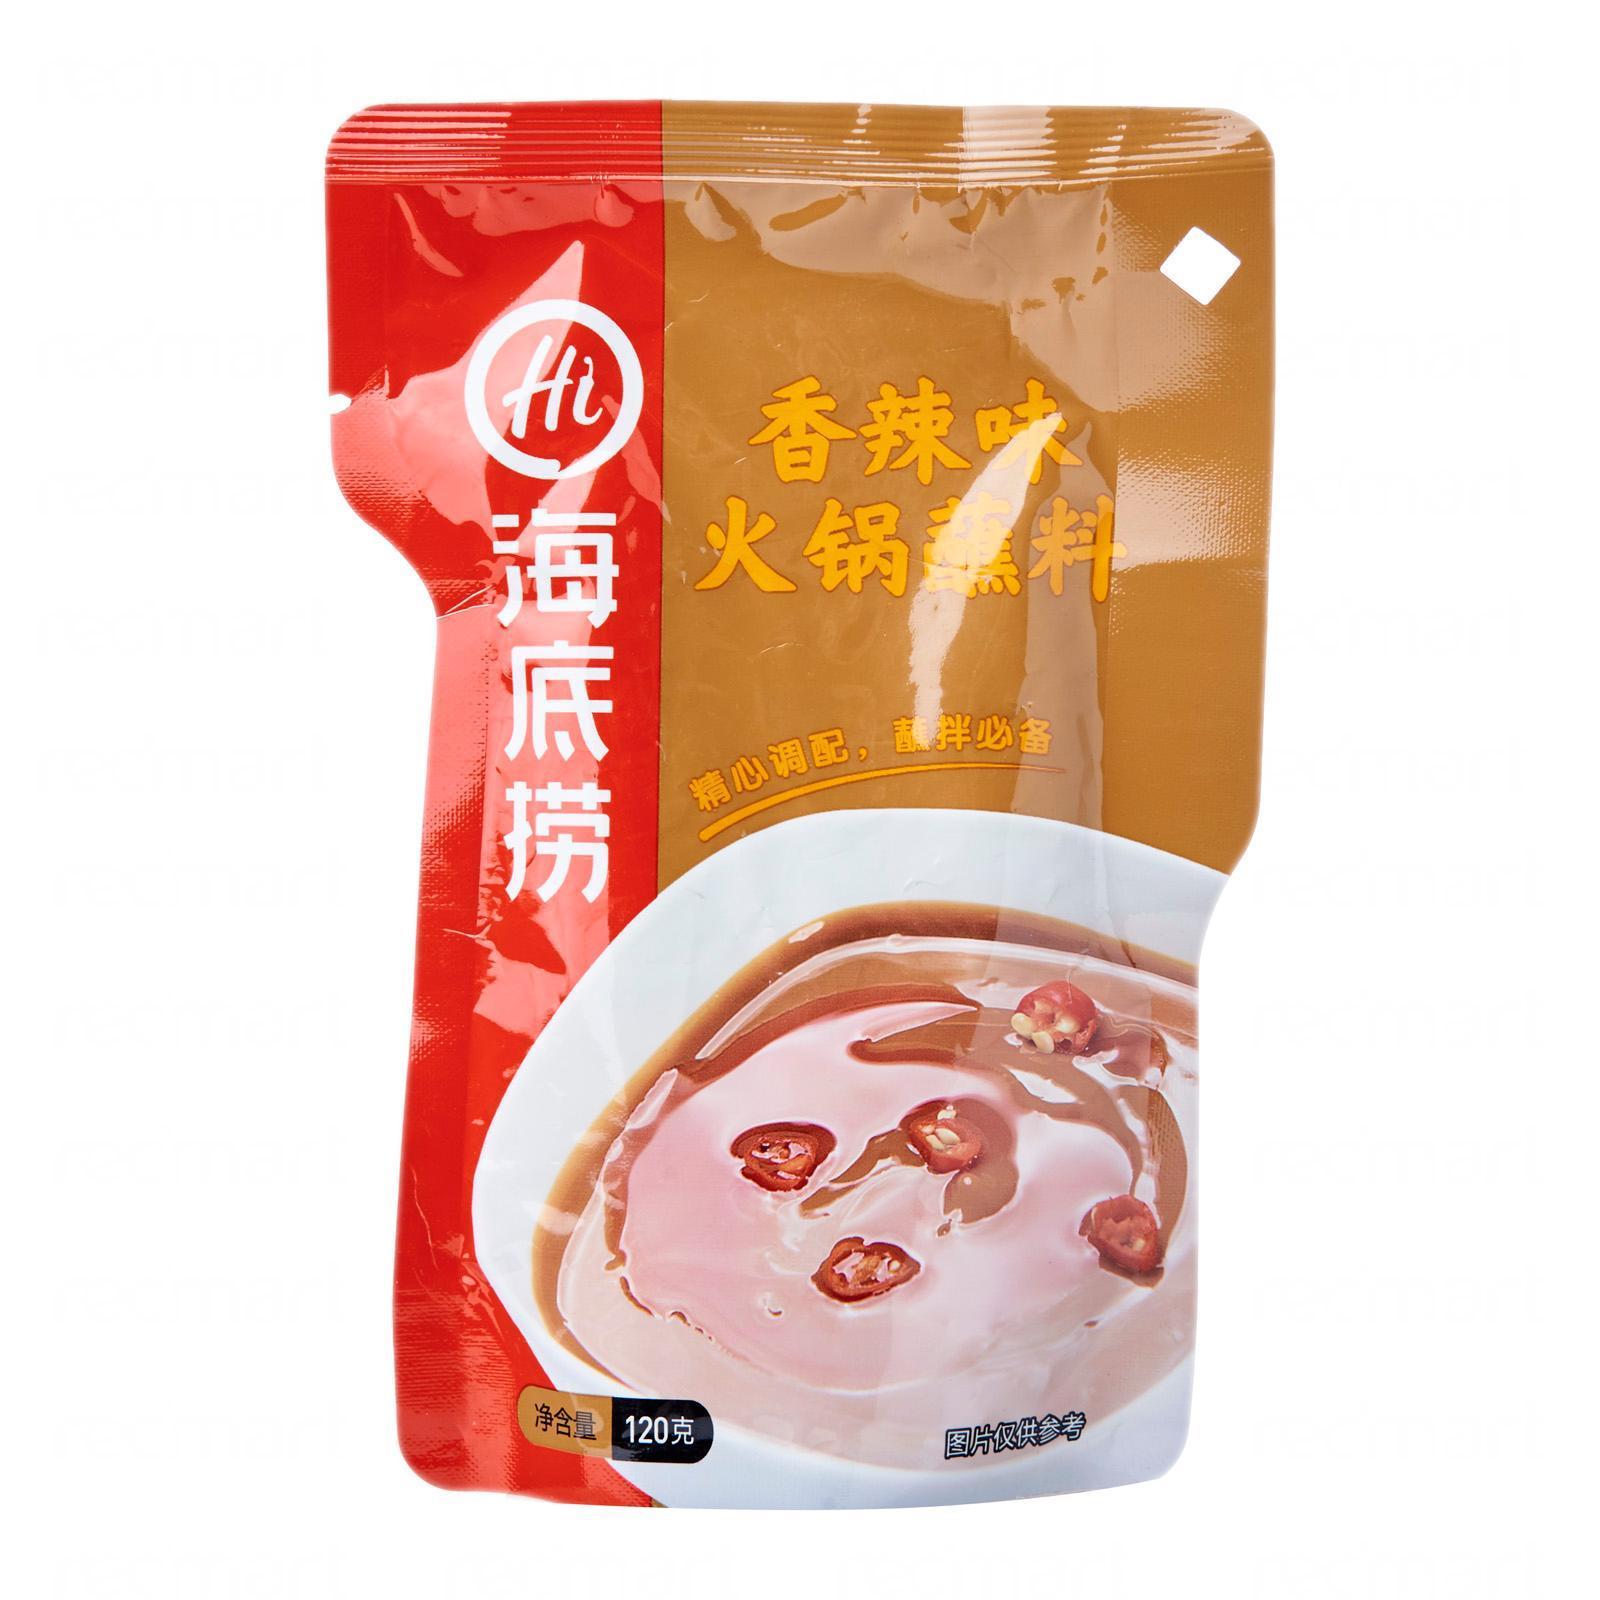 Hai Di Lao Xiang La Sauce - By FOOD SERVICE